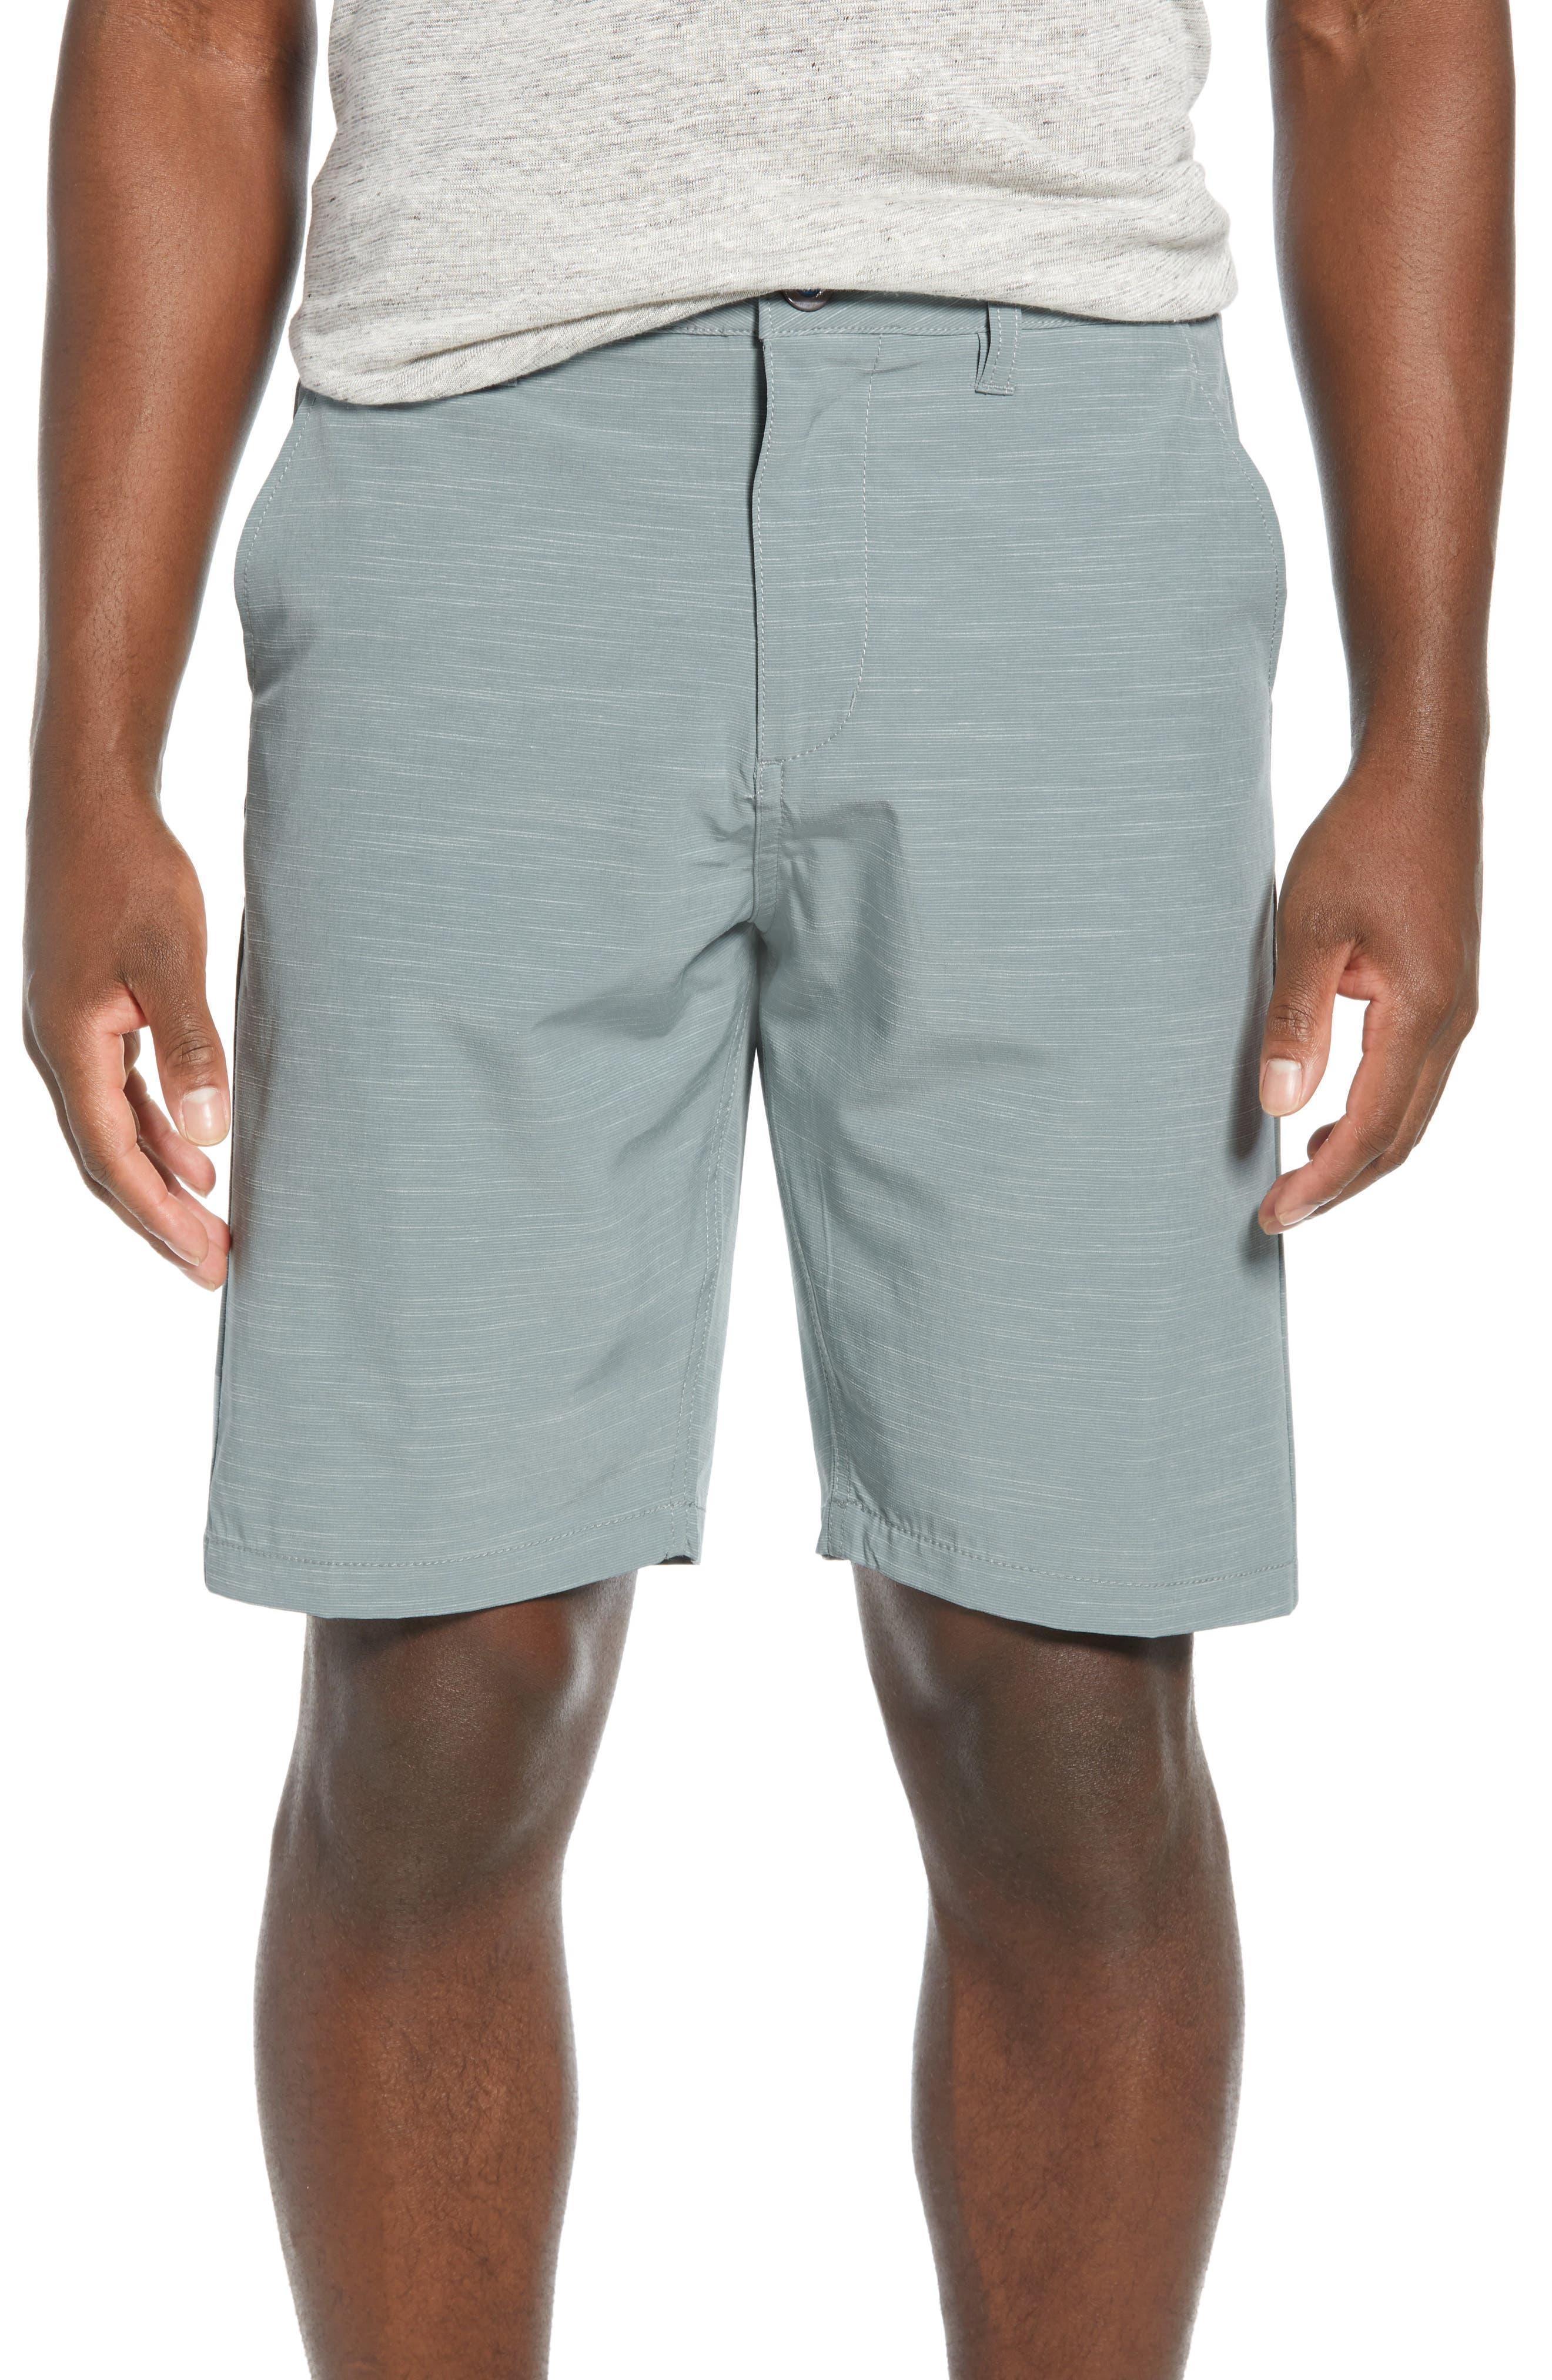 DEVEREUX Cruiser Hybrid Shorts, Main, color, SMOKE GREEN